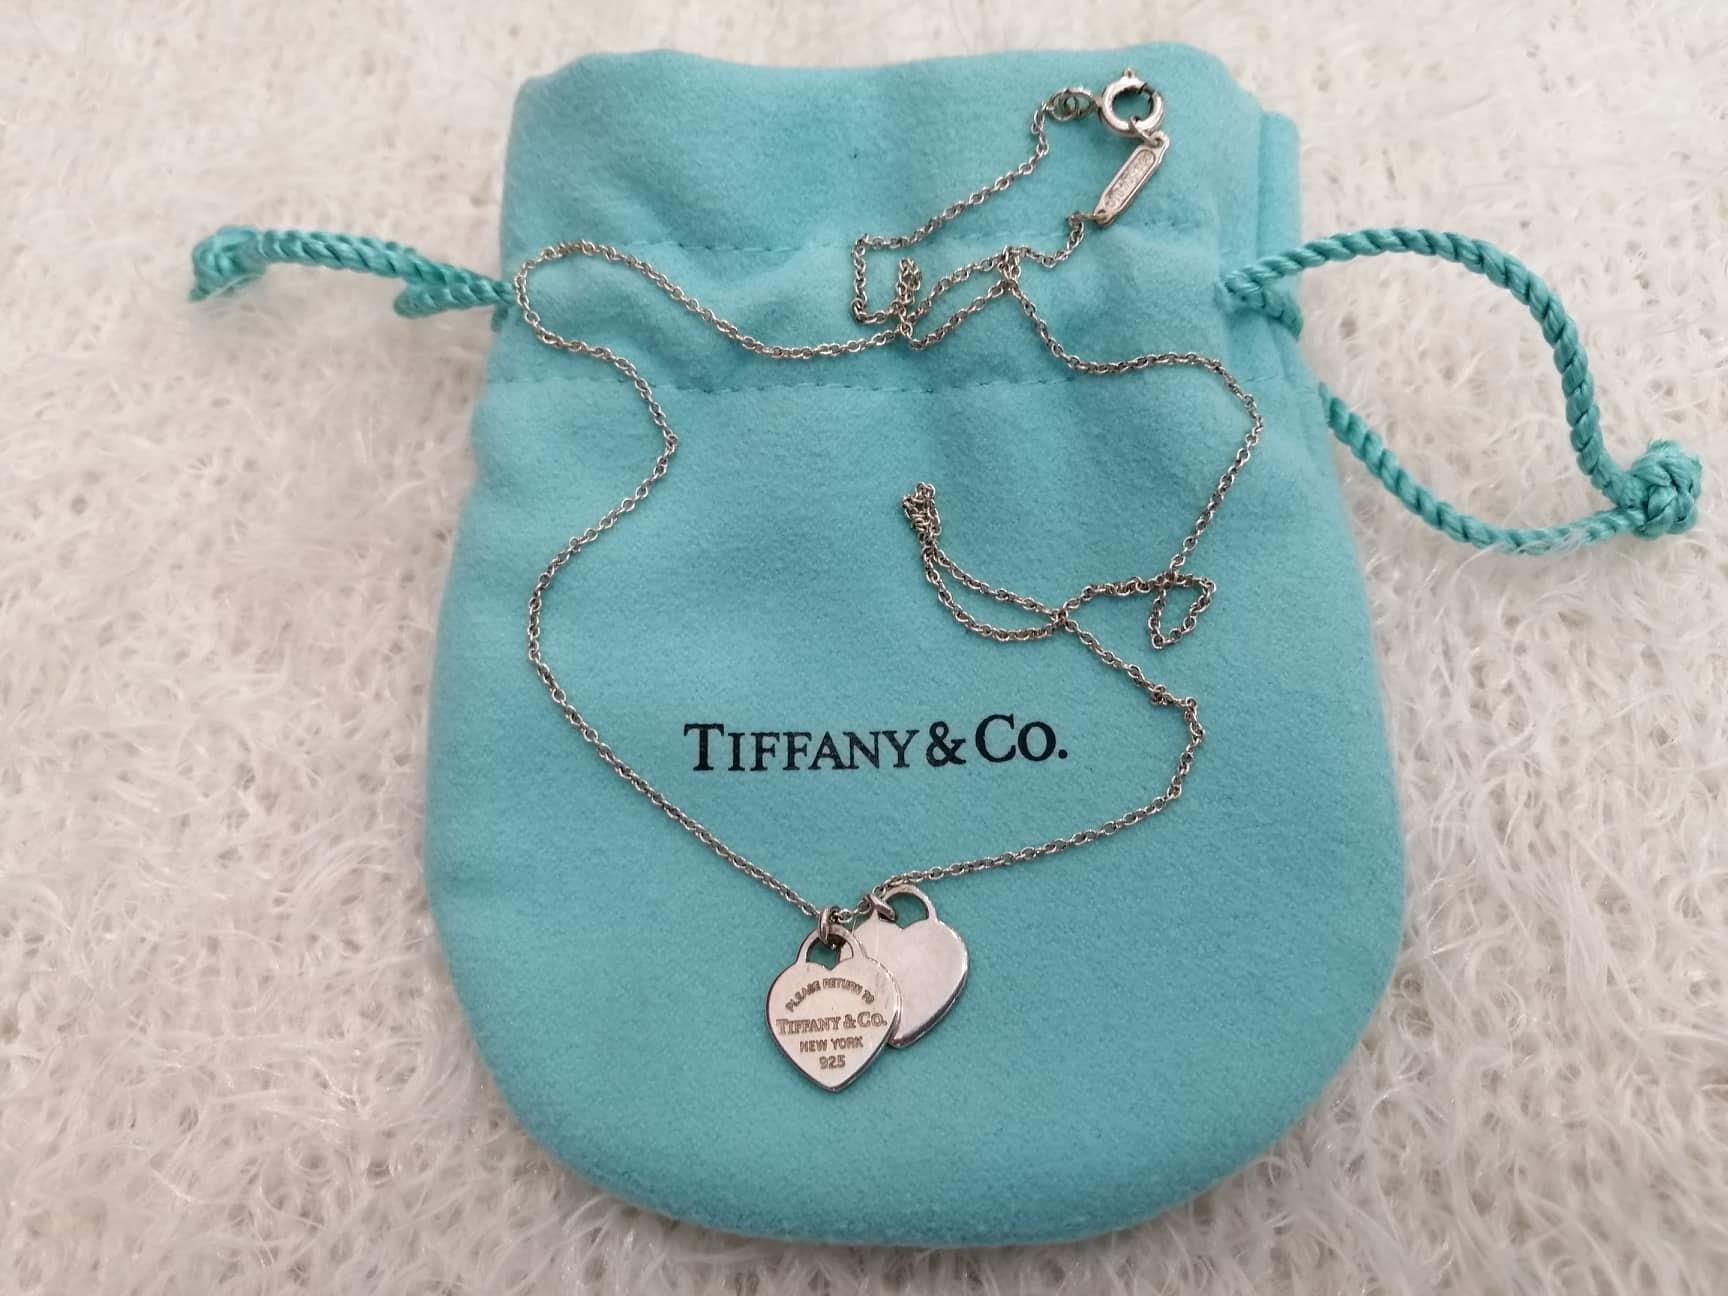 Vì sao dây chuyền Tiffany & Co